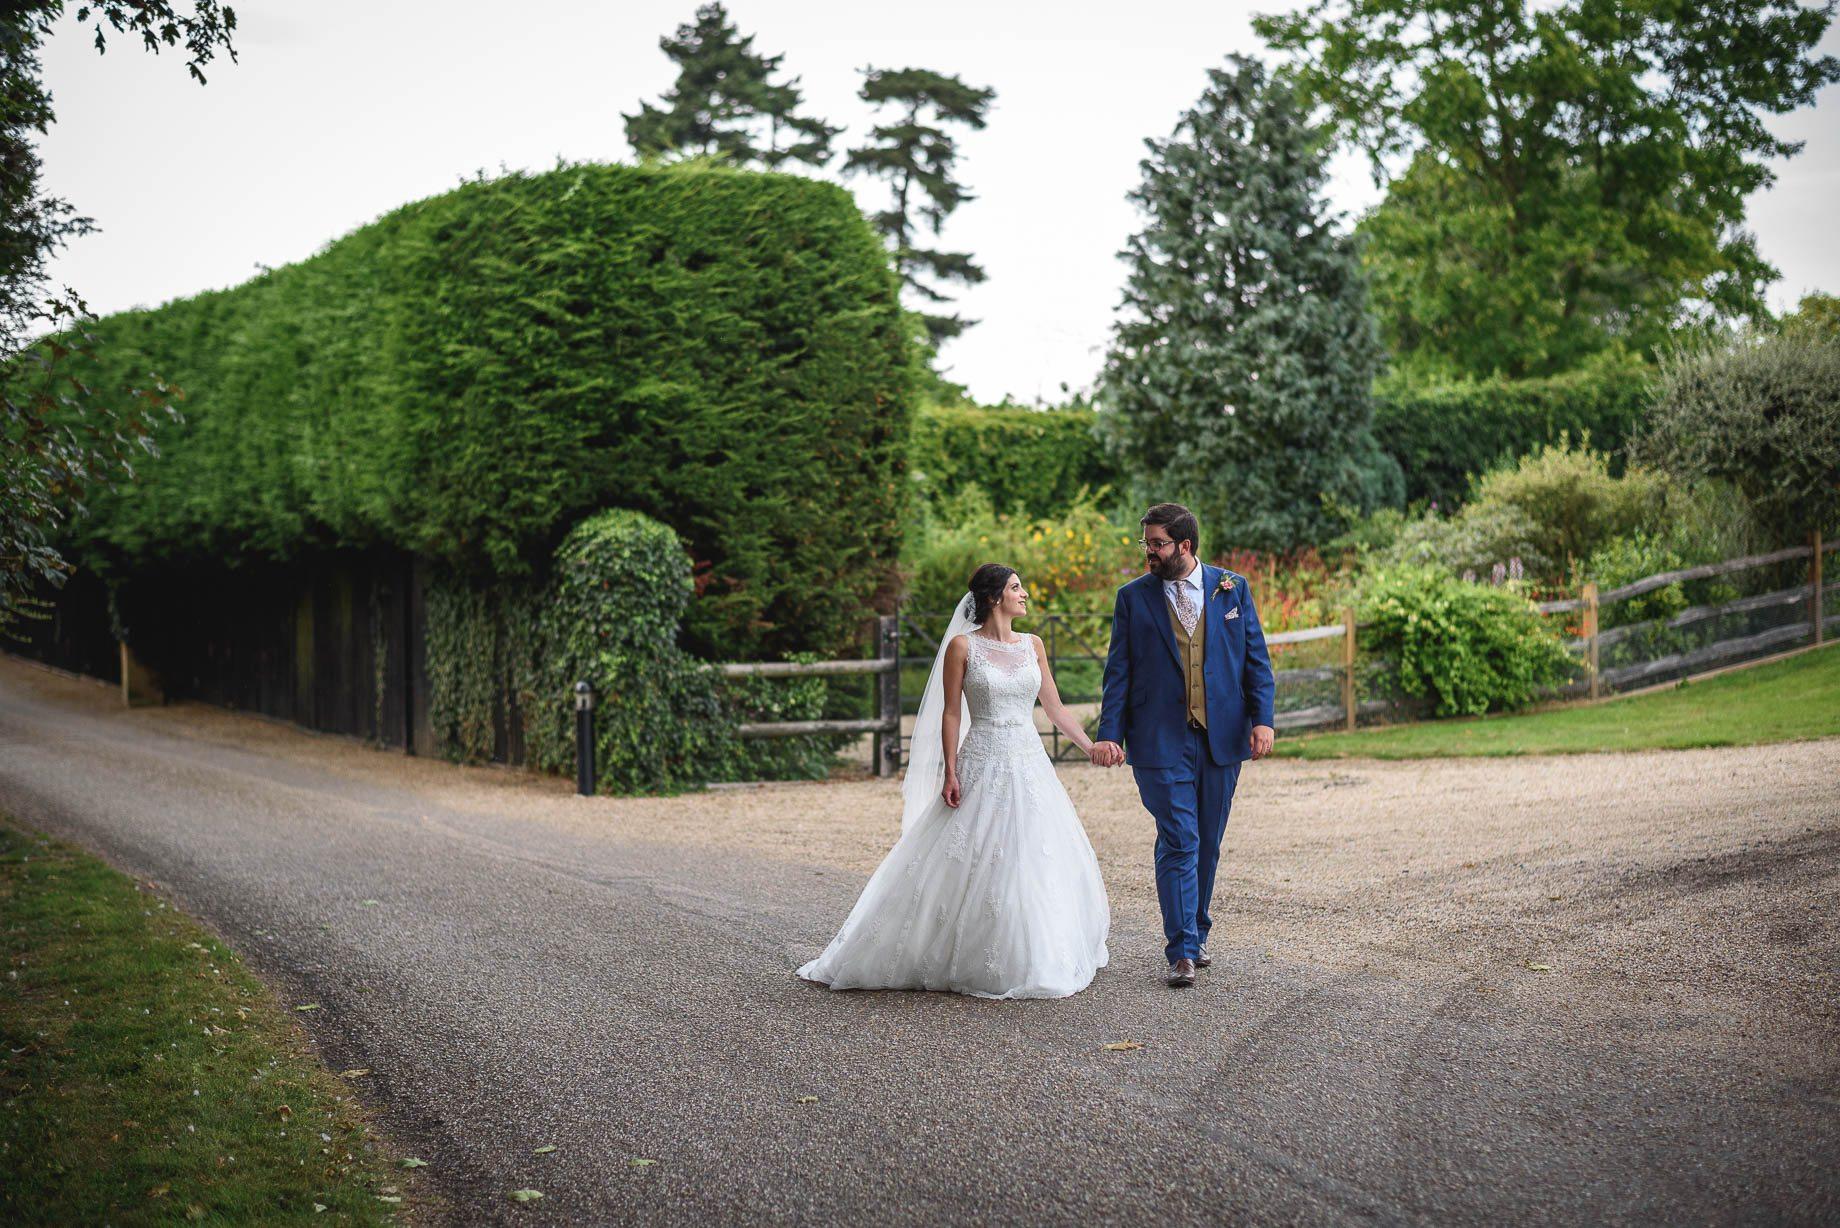 Gaynes Park wedding photography - Guy Collier Photography - Rachel and Jon (142 of 169)